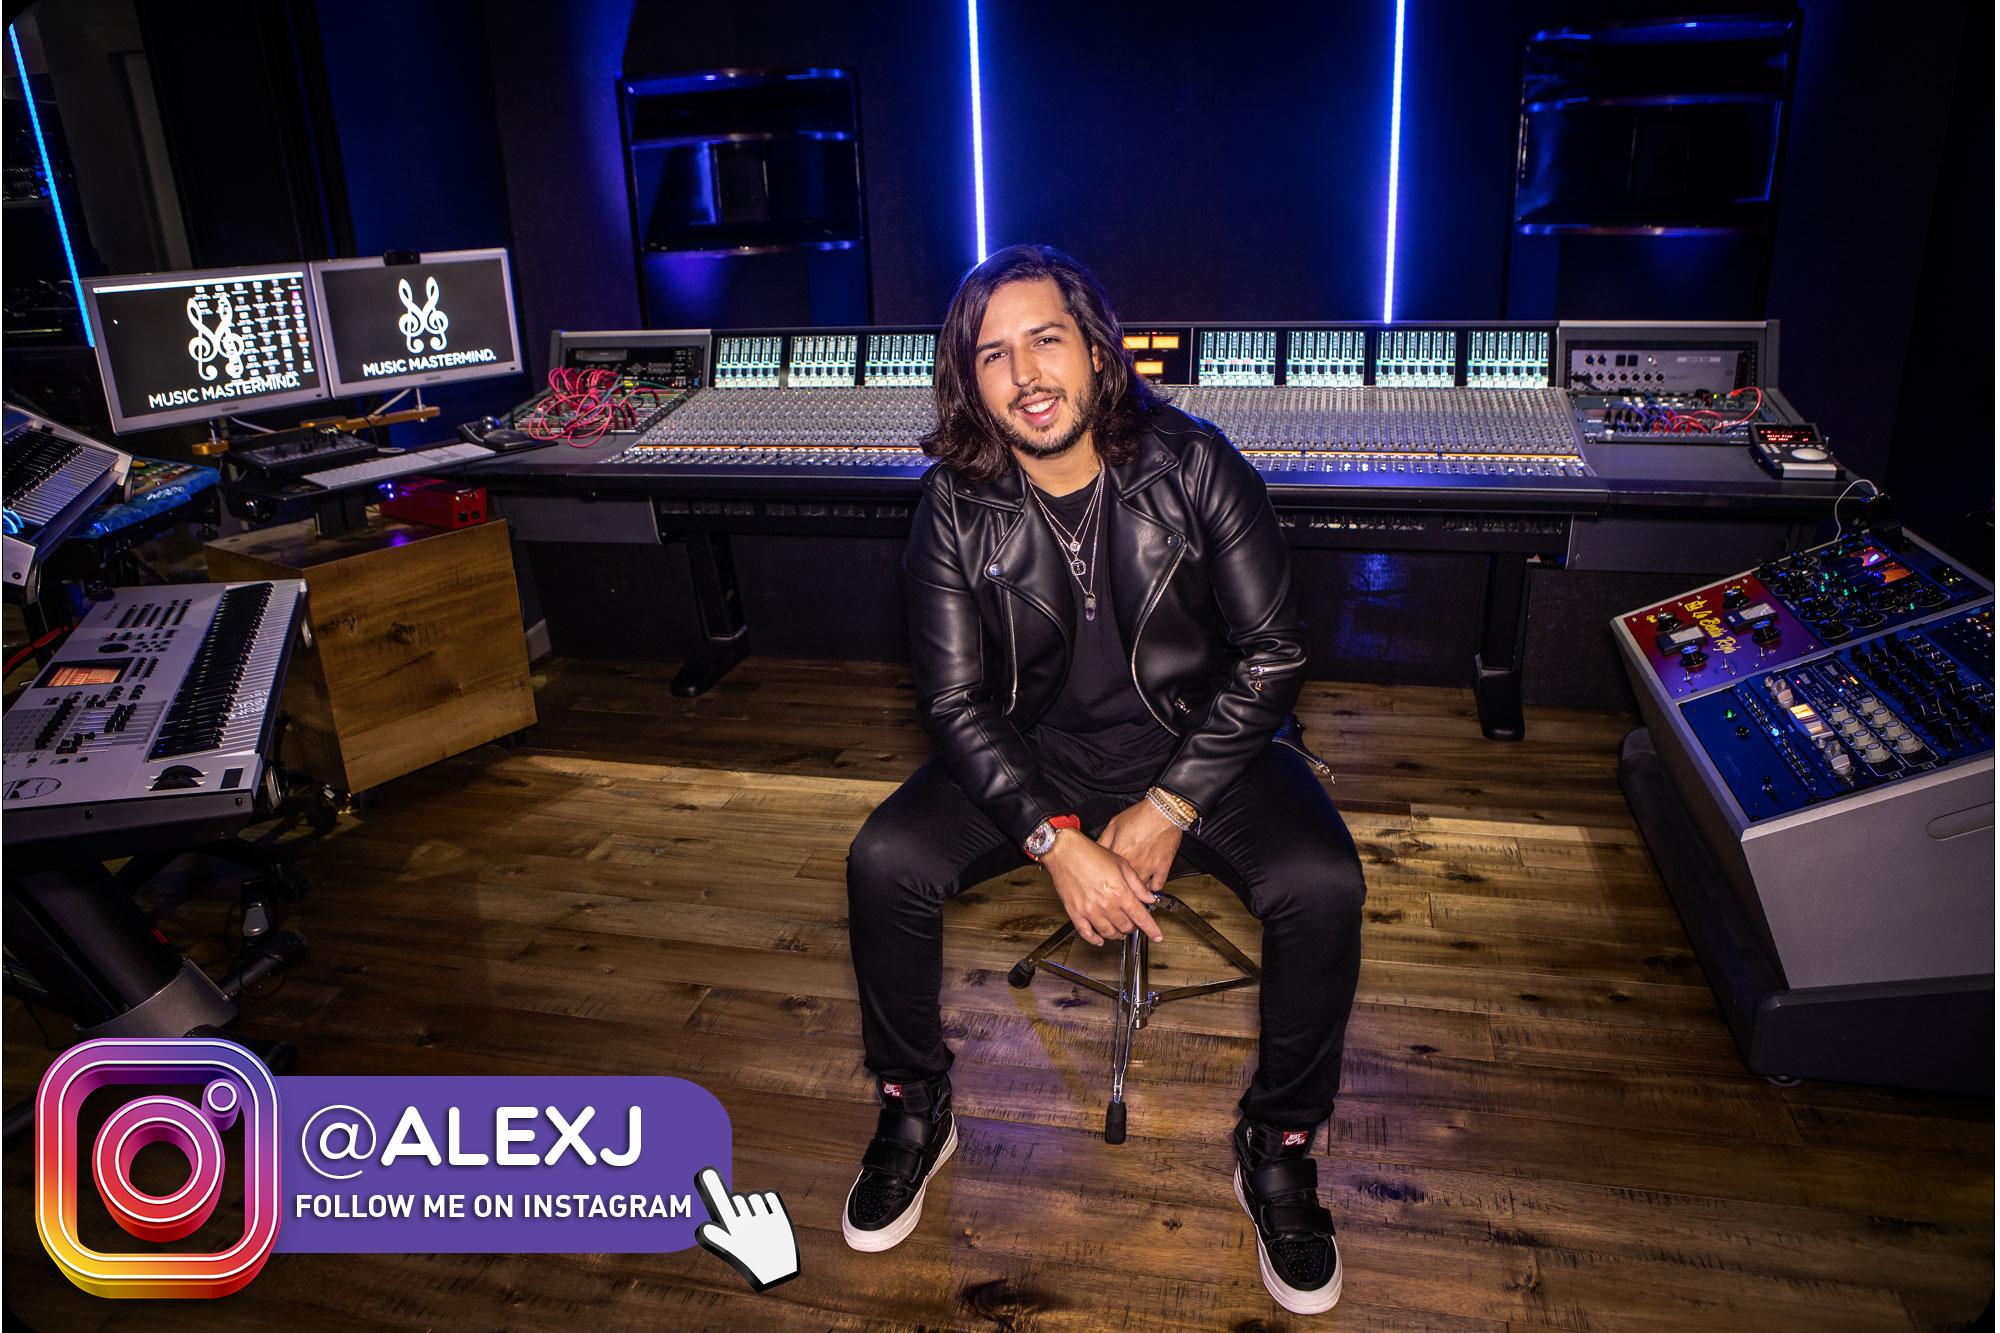 Alex J | noisematch STudios \ Miami FL \ Music Producer